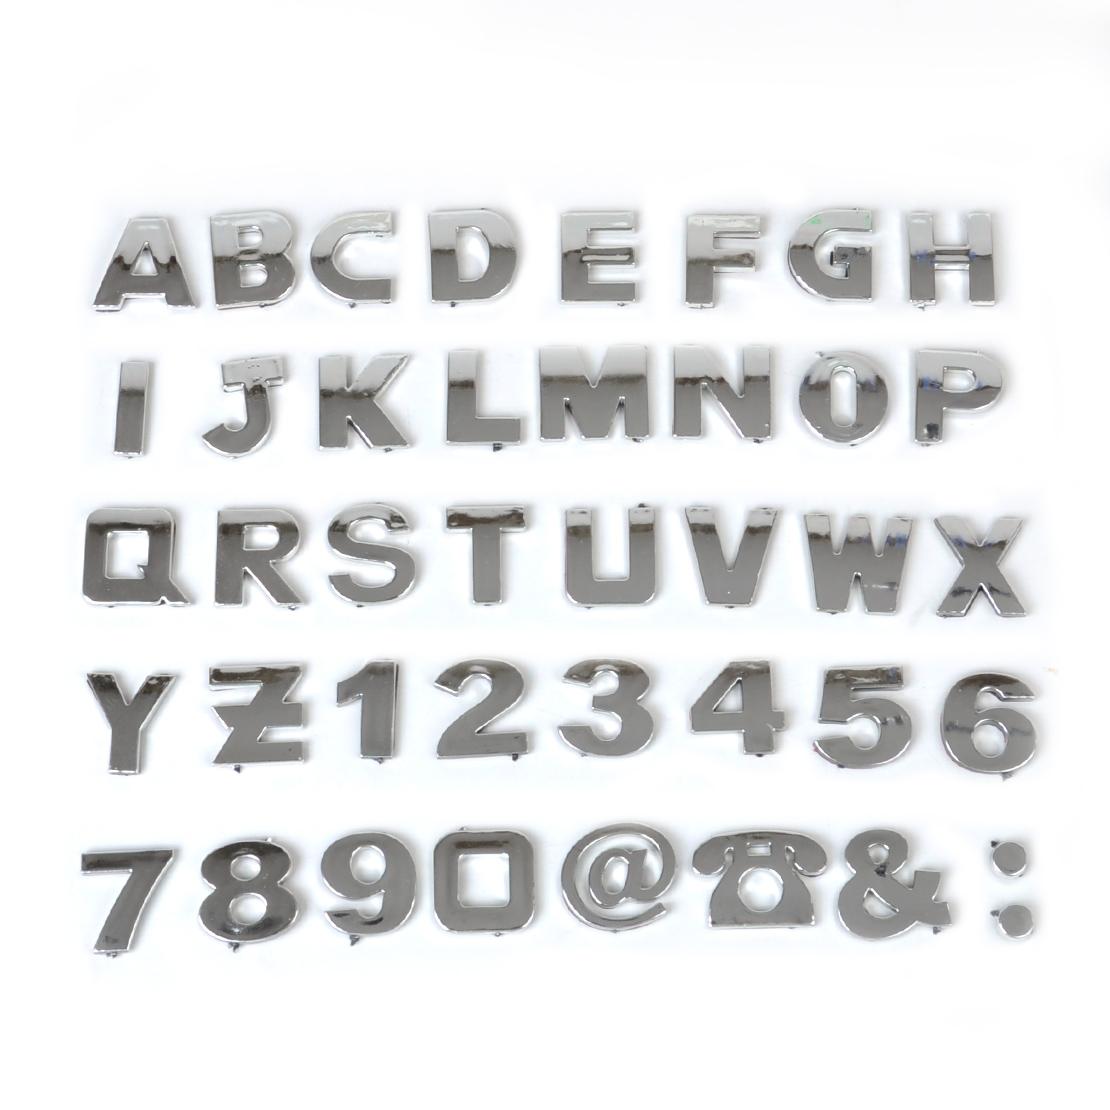 40pcs DIY 3D Chrome Car Emblem Sticker Alphabet Letter Number Symbol Badge Decal